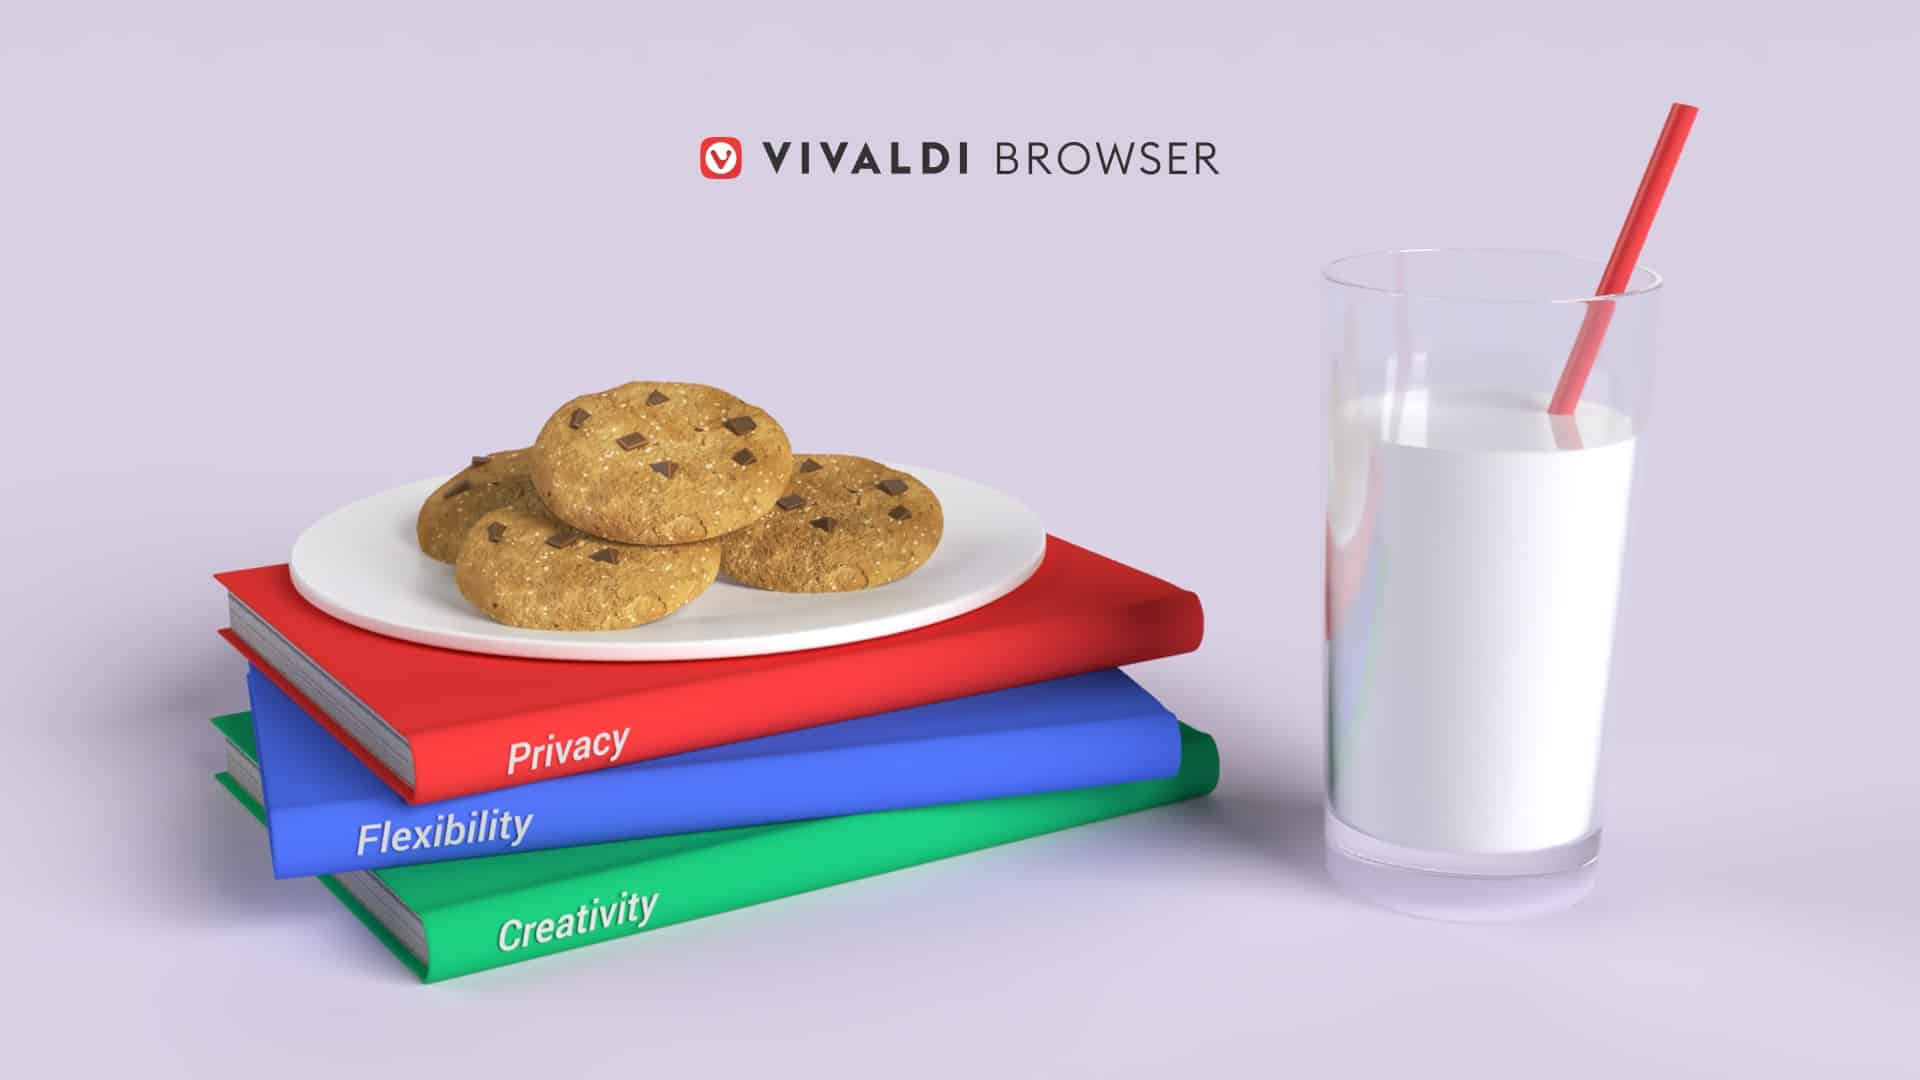 Vivaldi browser can now block cookie pop-ups, Google's FLoC